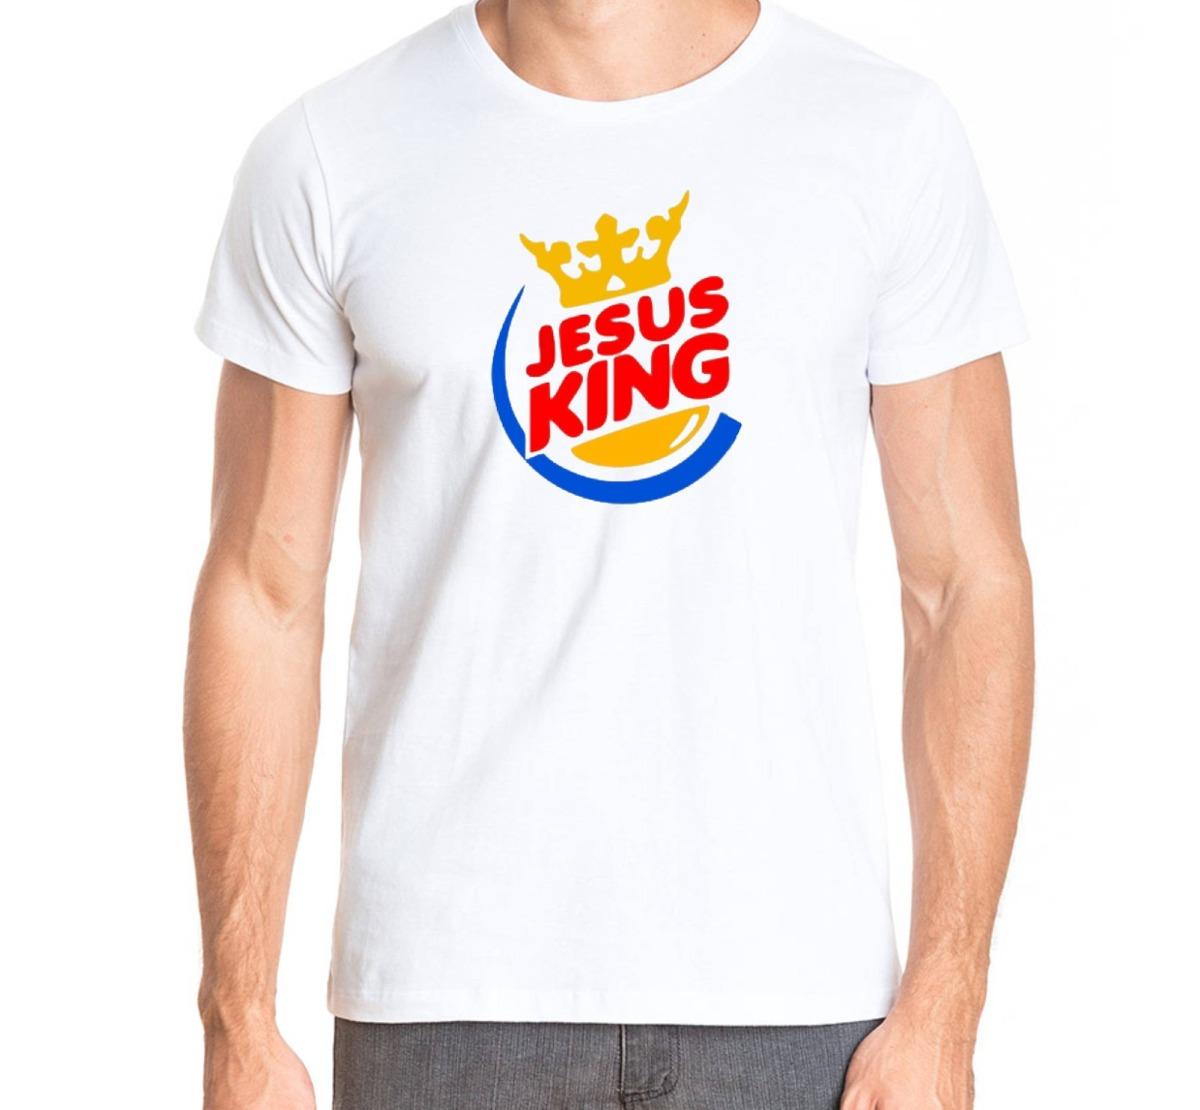 773d2a092 camisa gospel - jesus king - masculina e feminina. Carregando zoom.